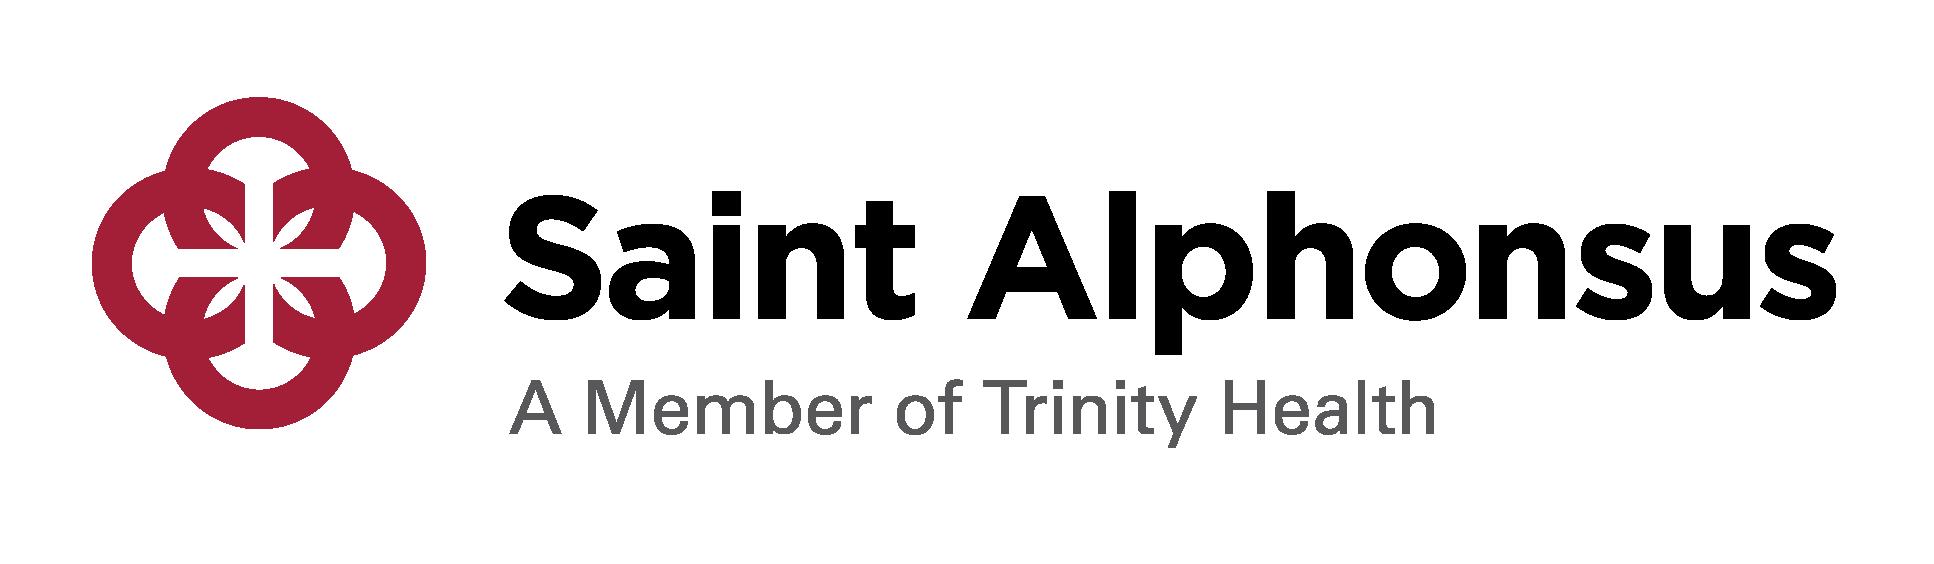 Saint_Alphonsus.png